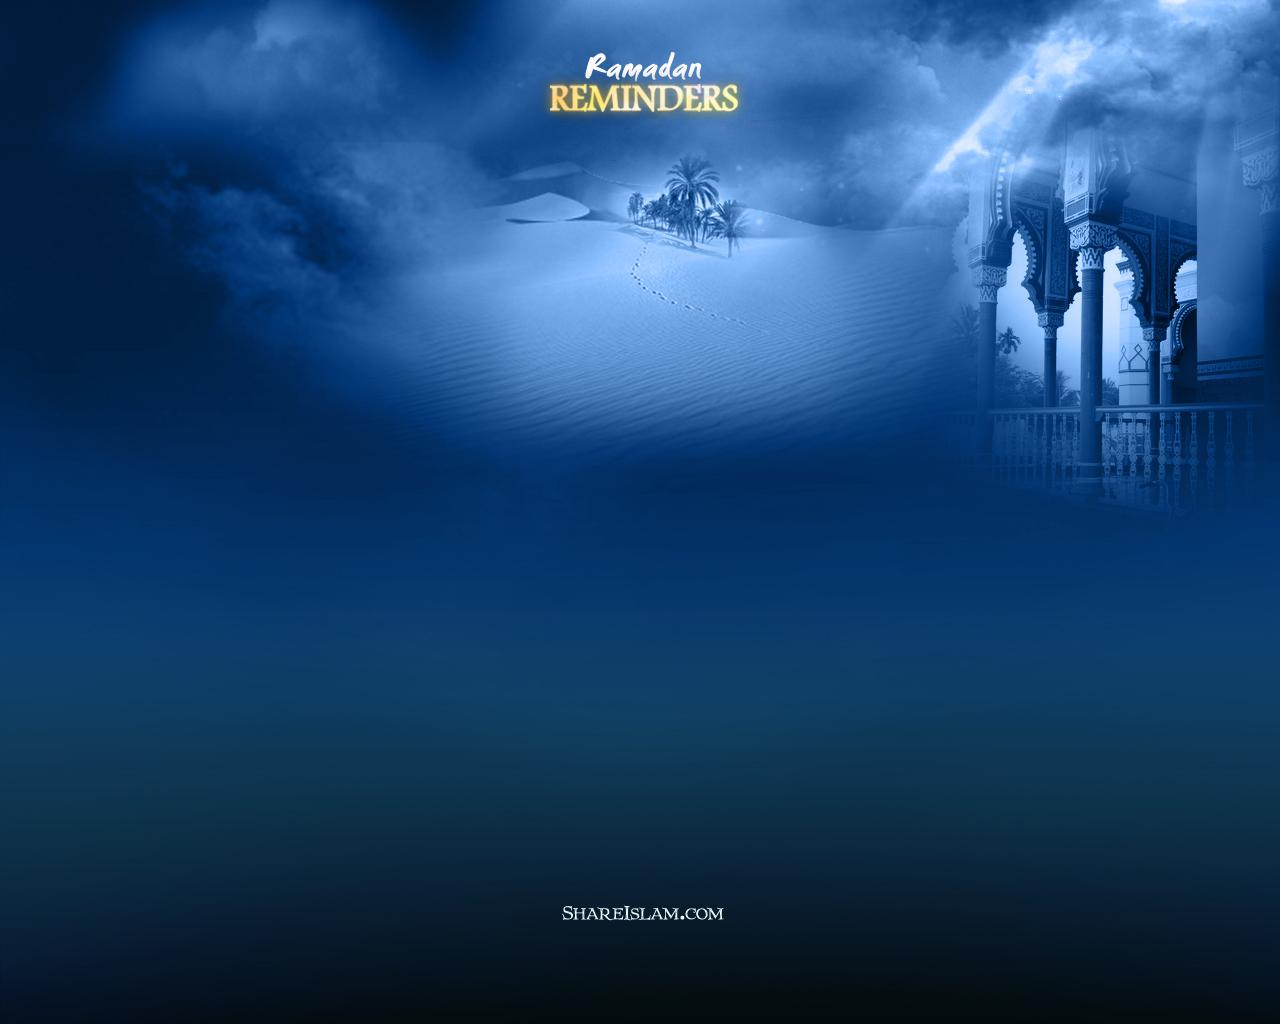 Amazing Reminder Ramadan Wallpaper - ShareIslam_Ramadan_01_1280x1024  Collection_916690 .jpg